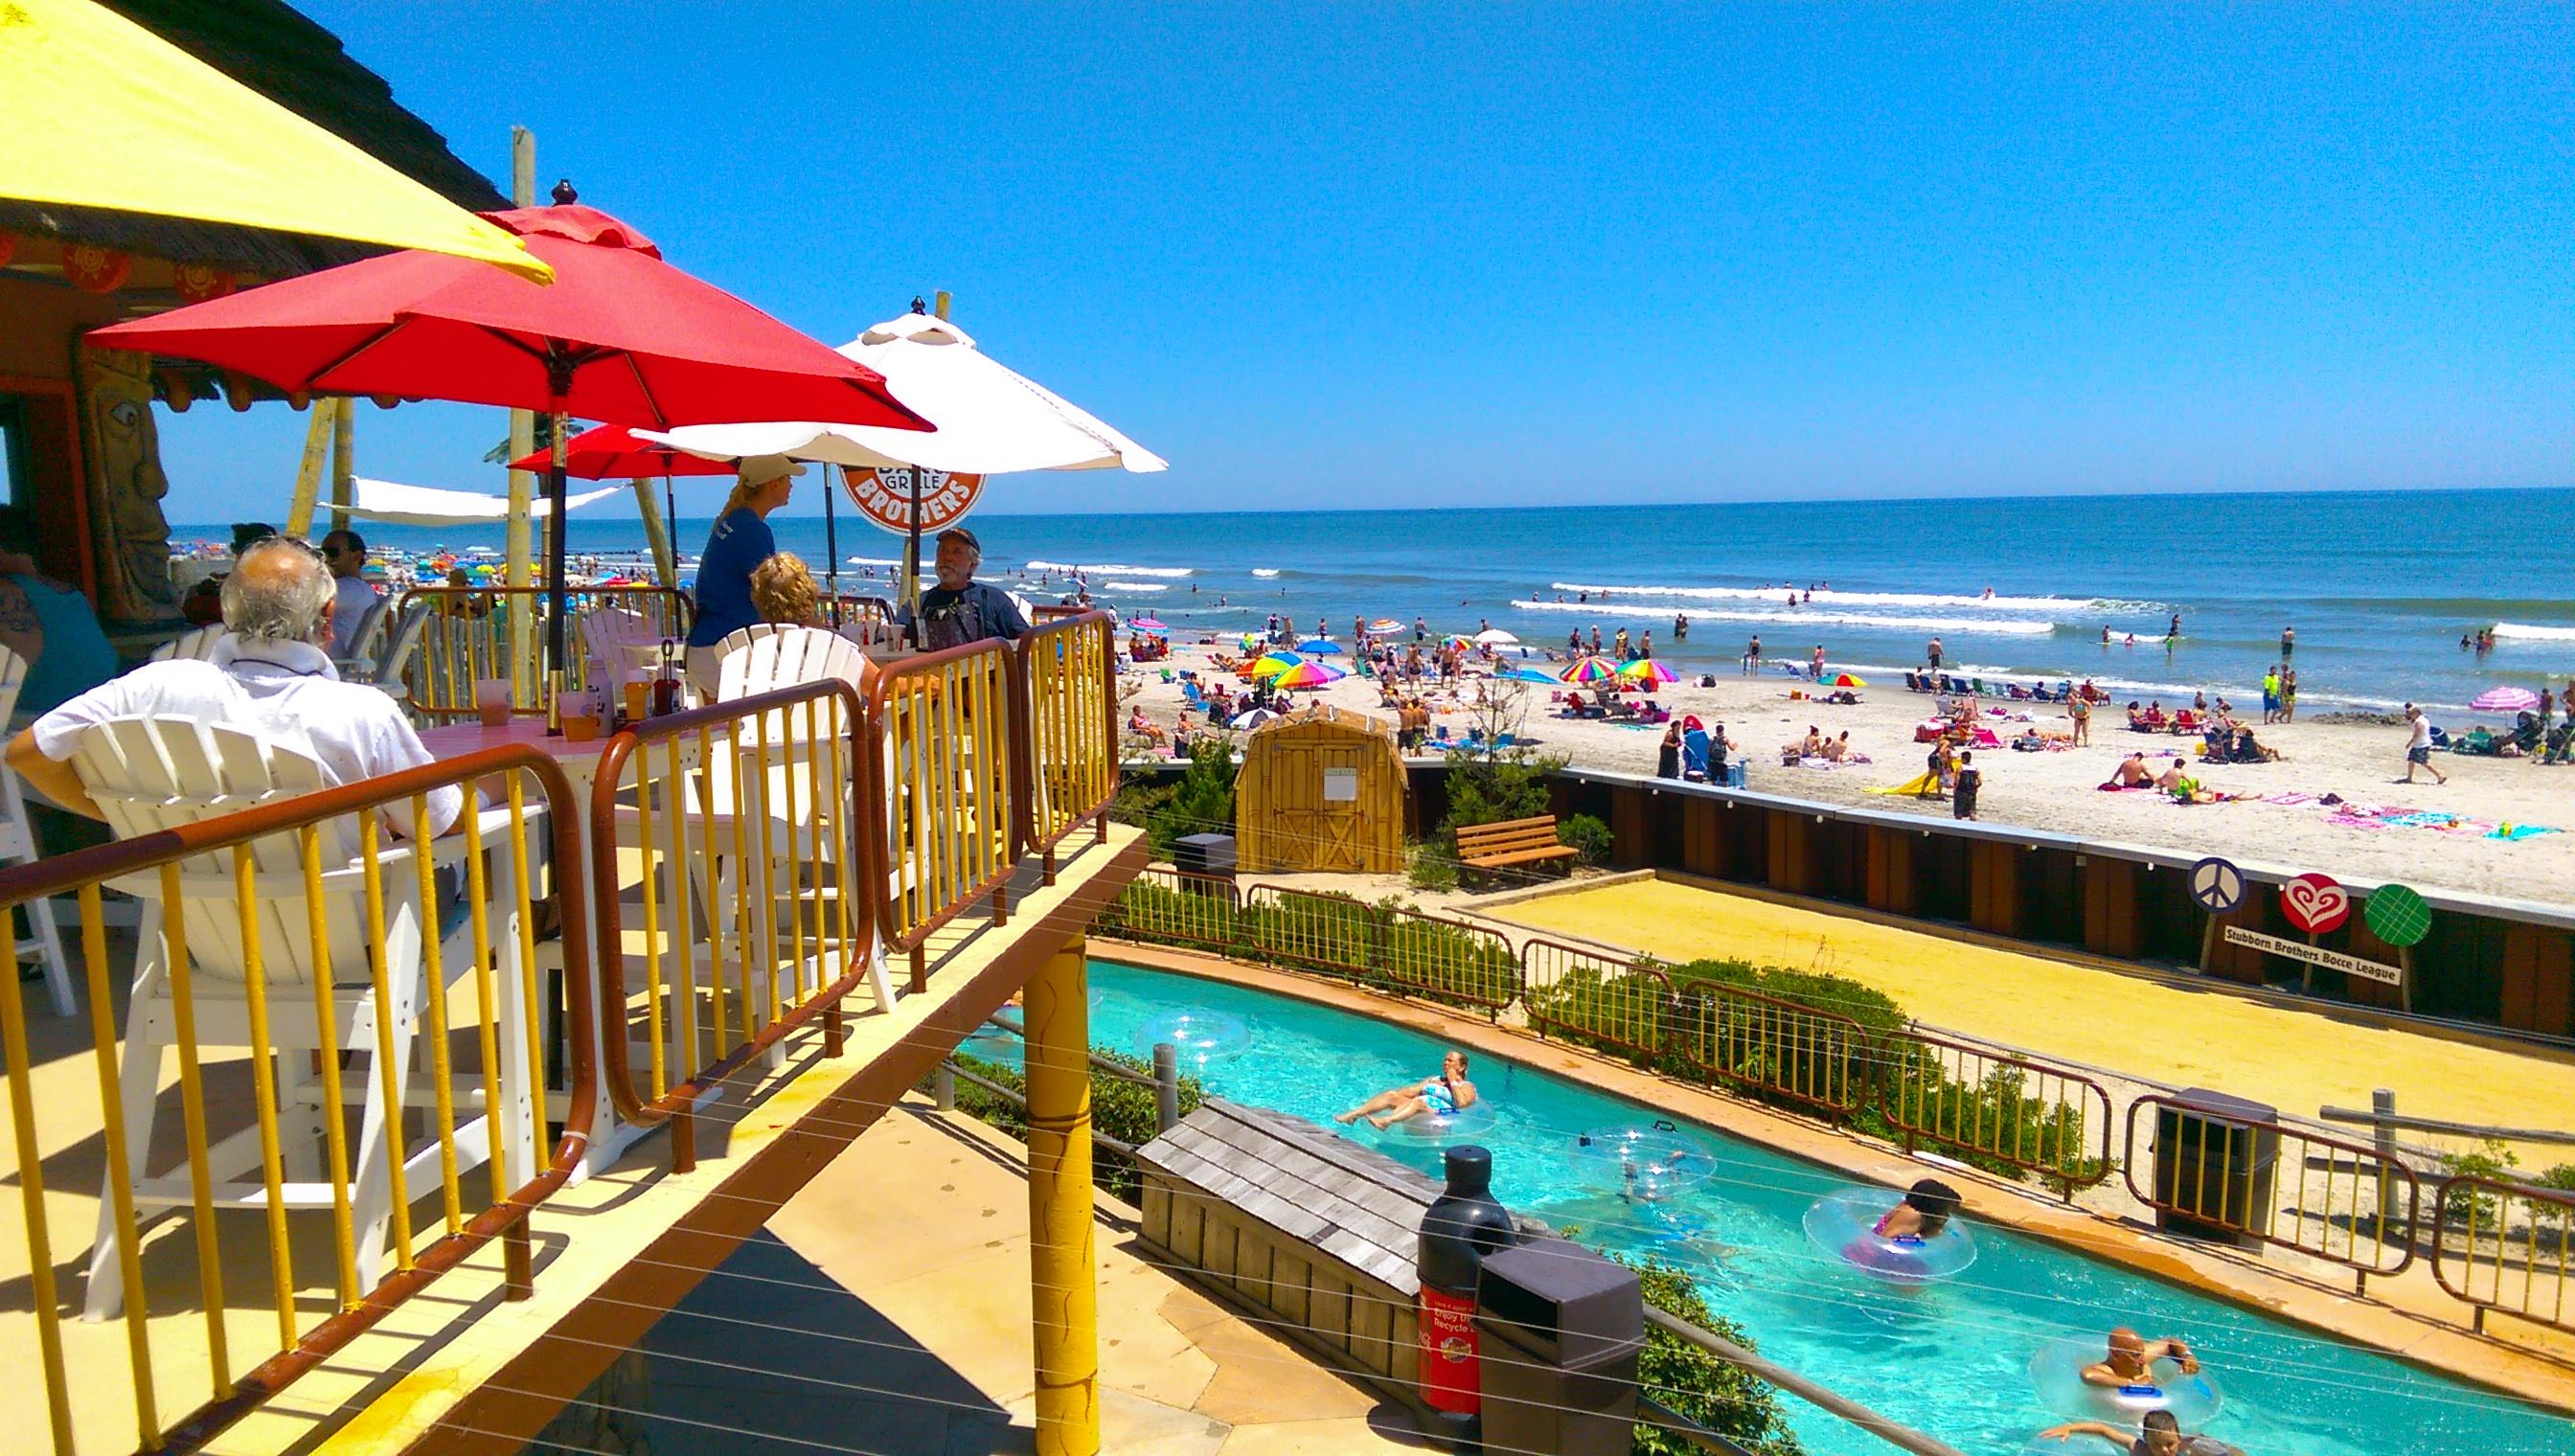 Wildwood Beach Bar